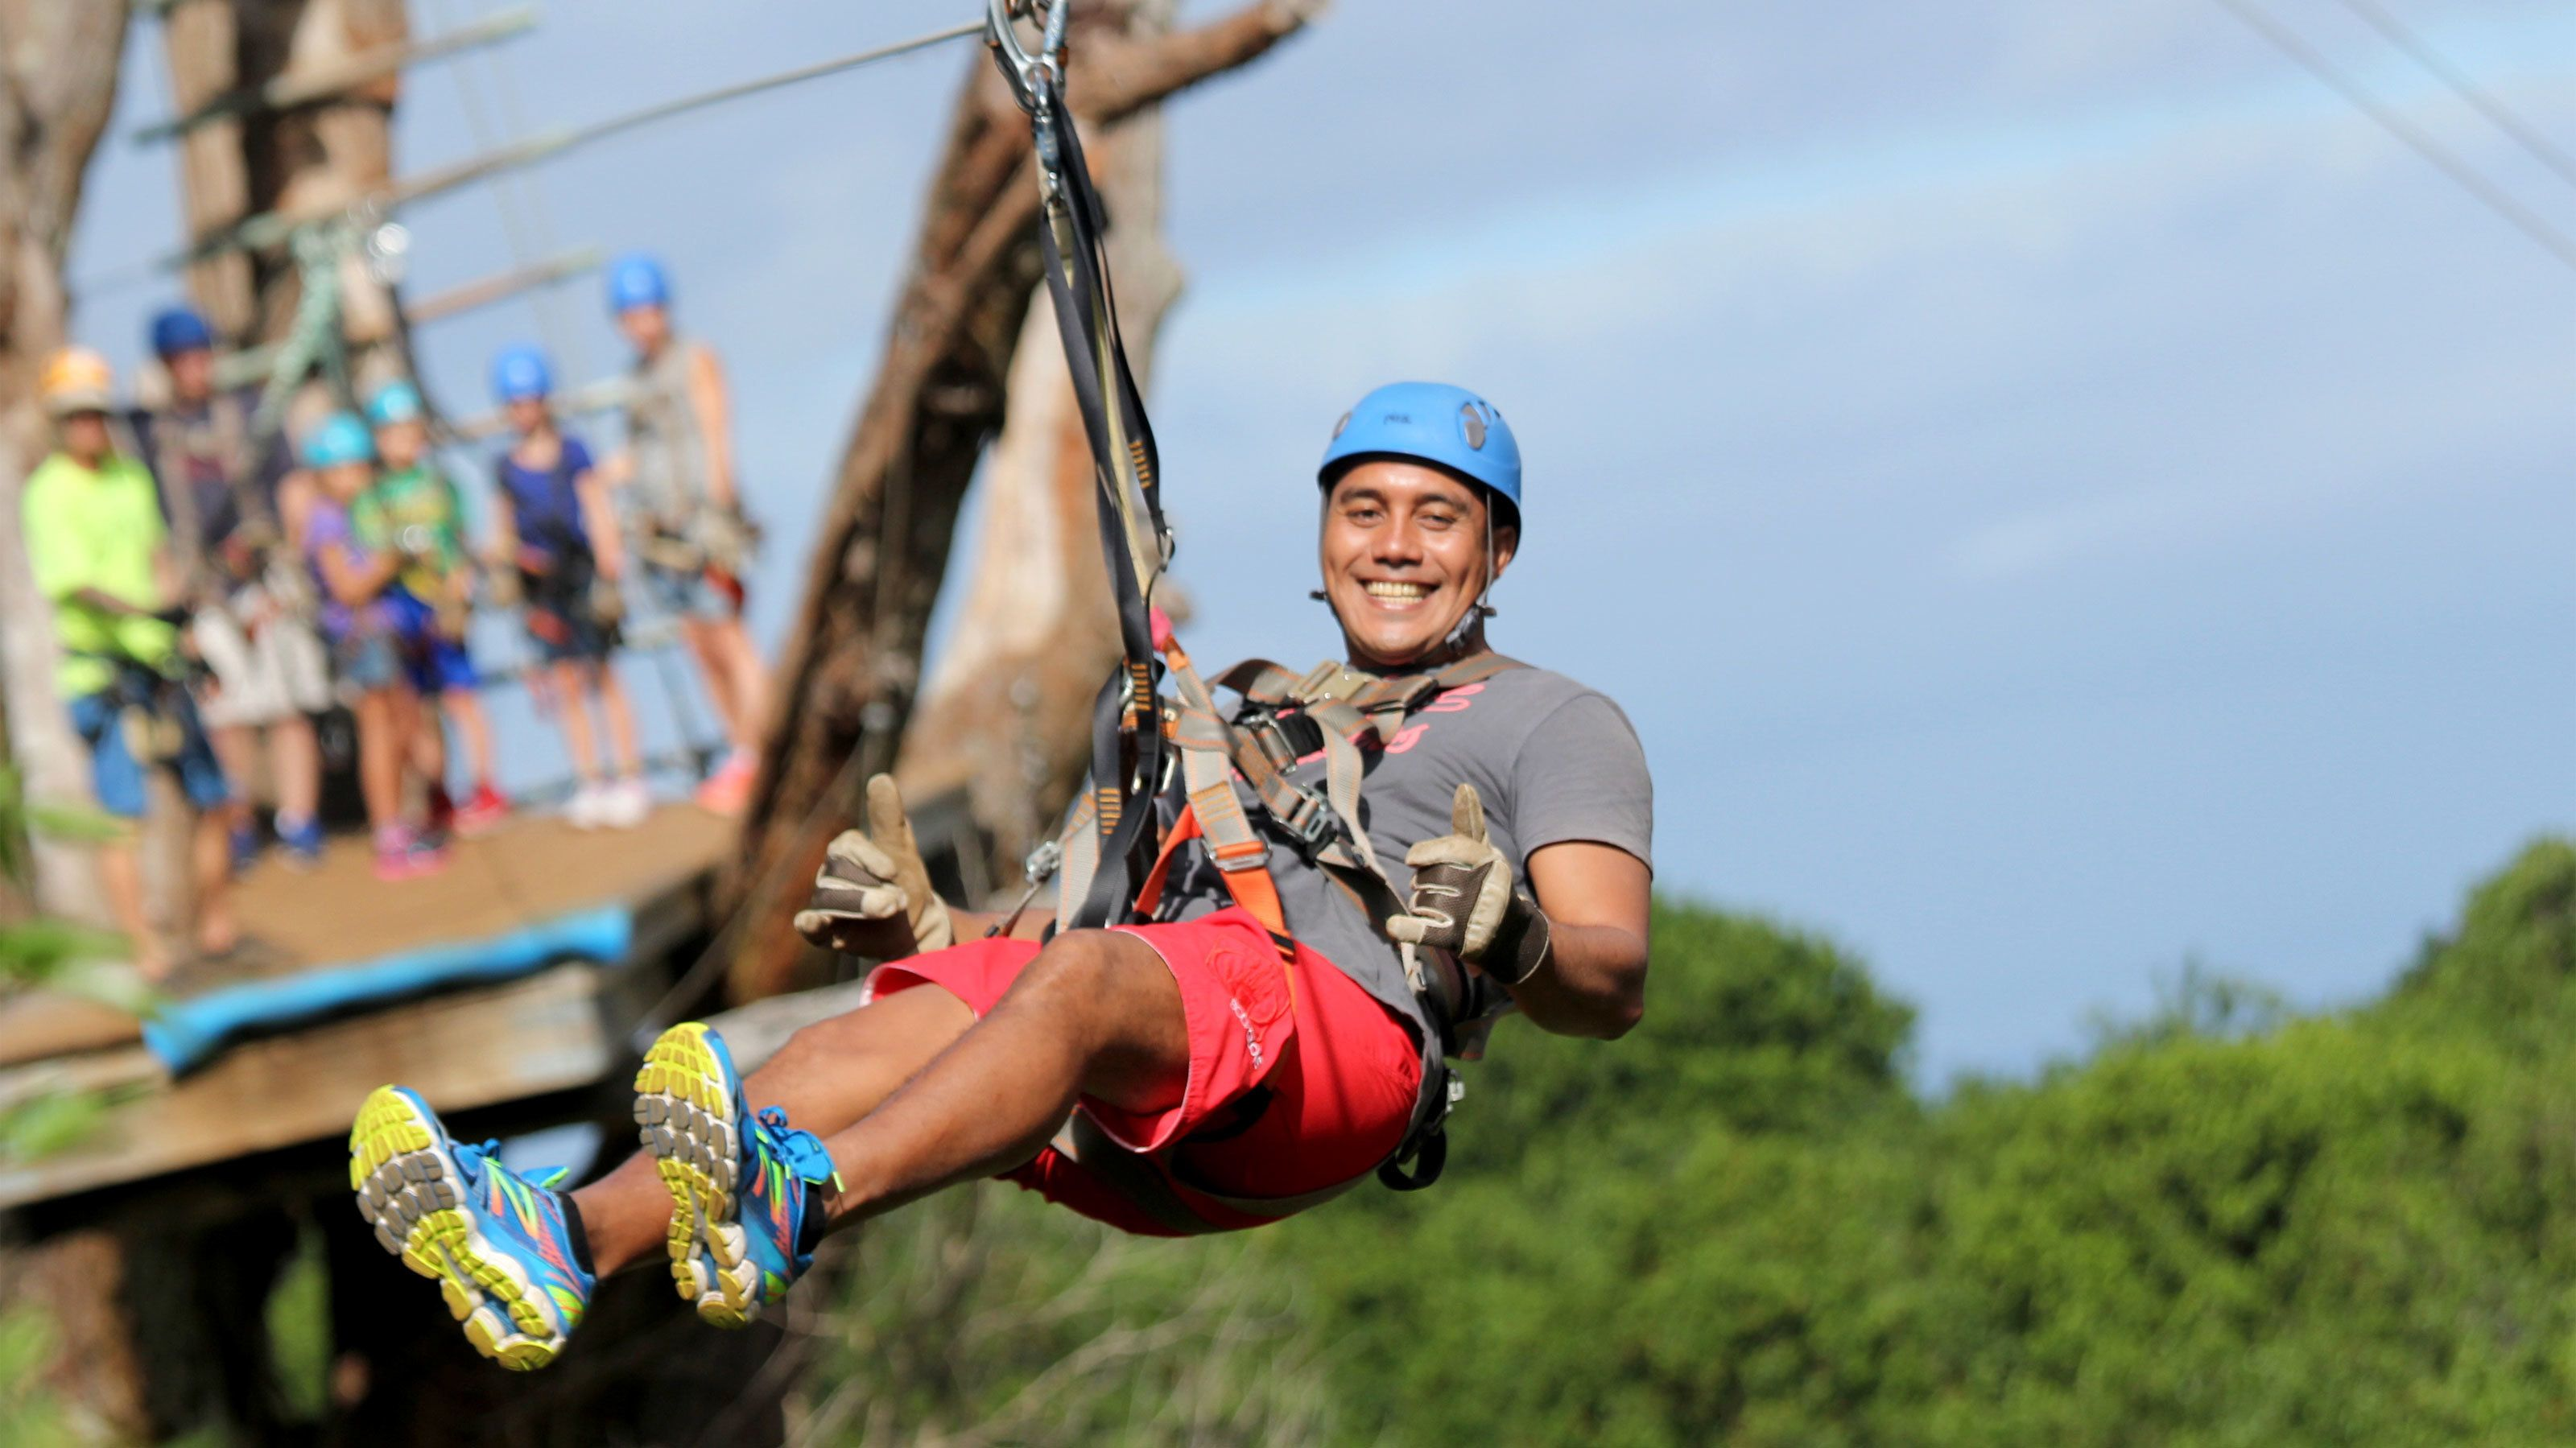 NorthShore 7-Line Zipline Adventure